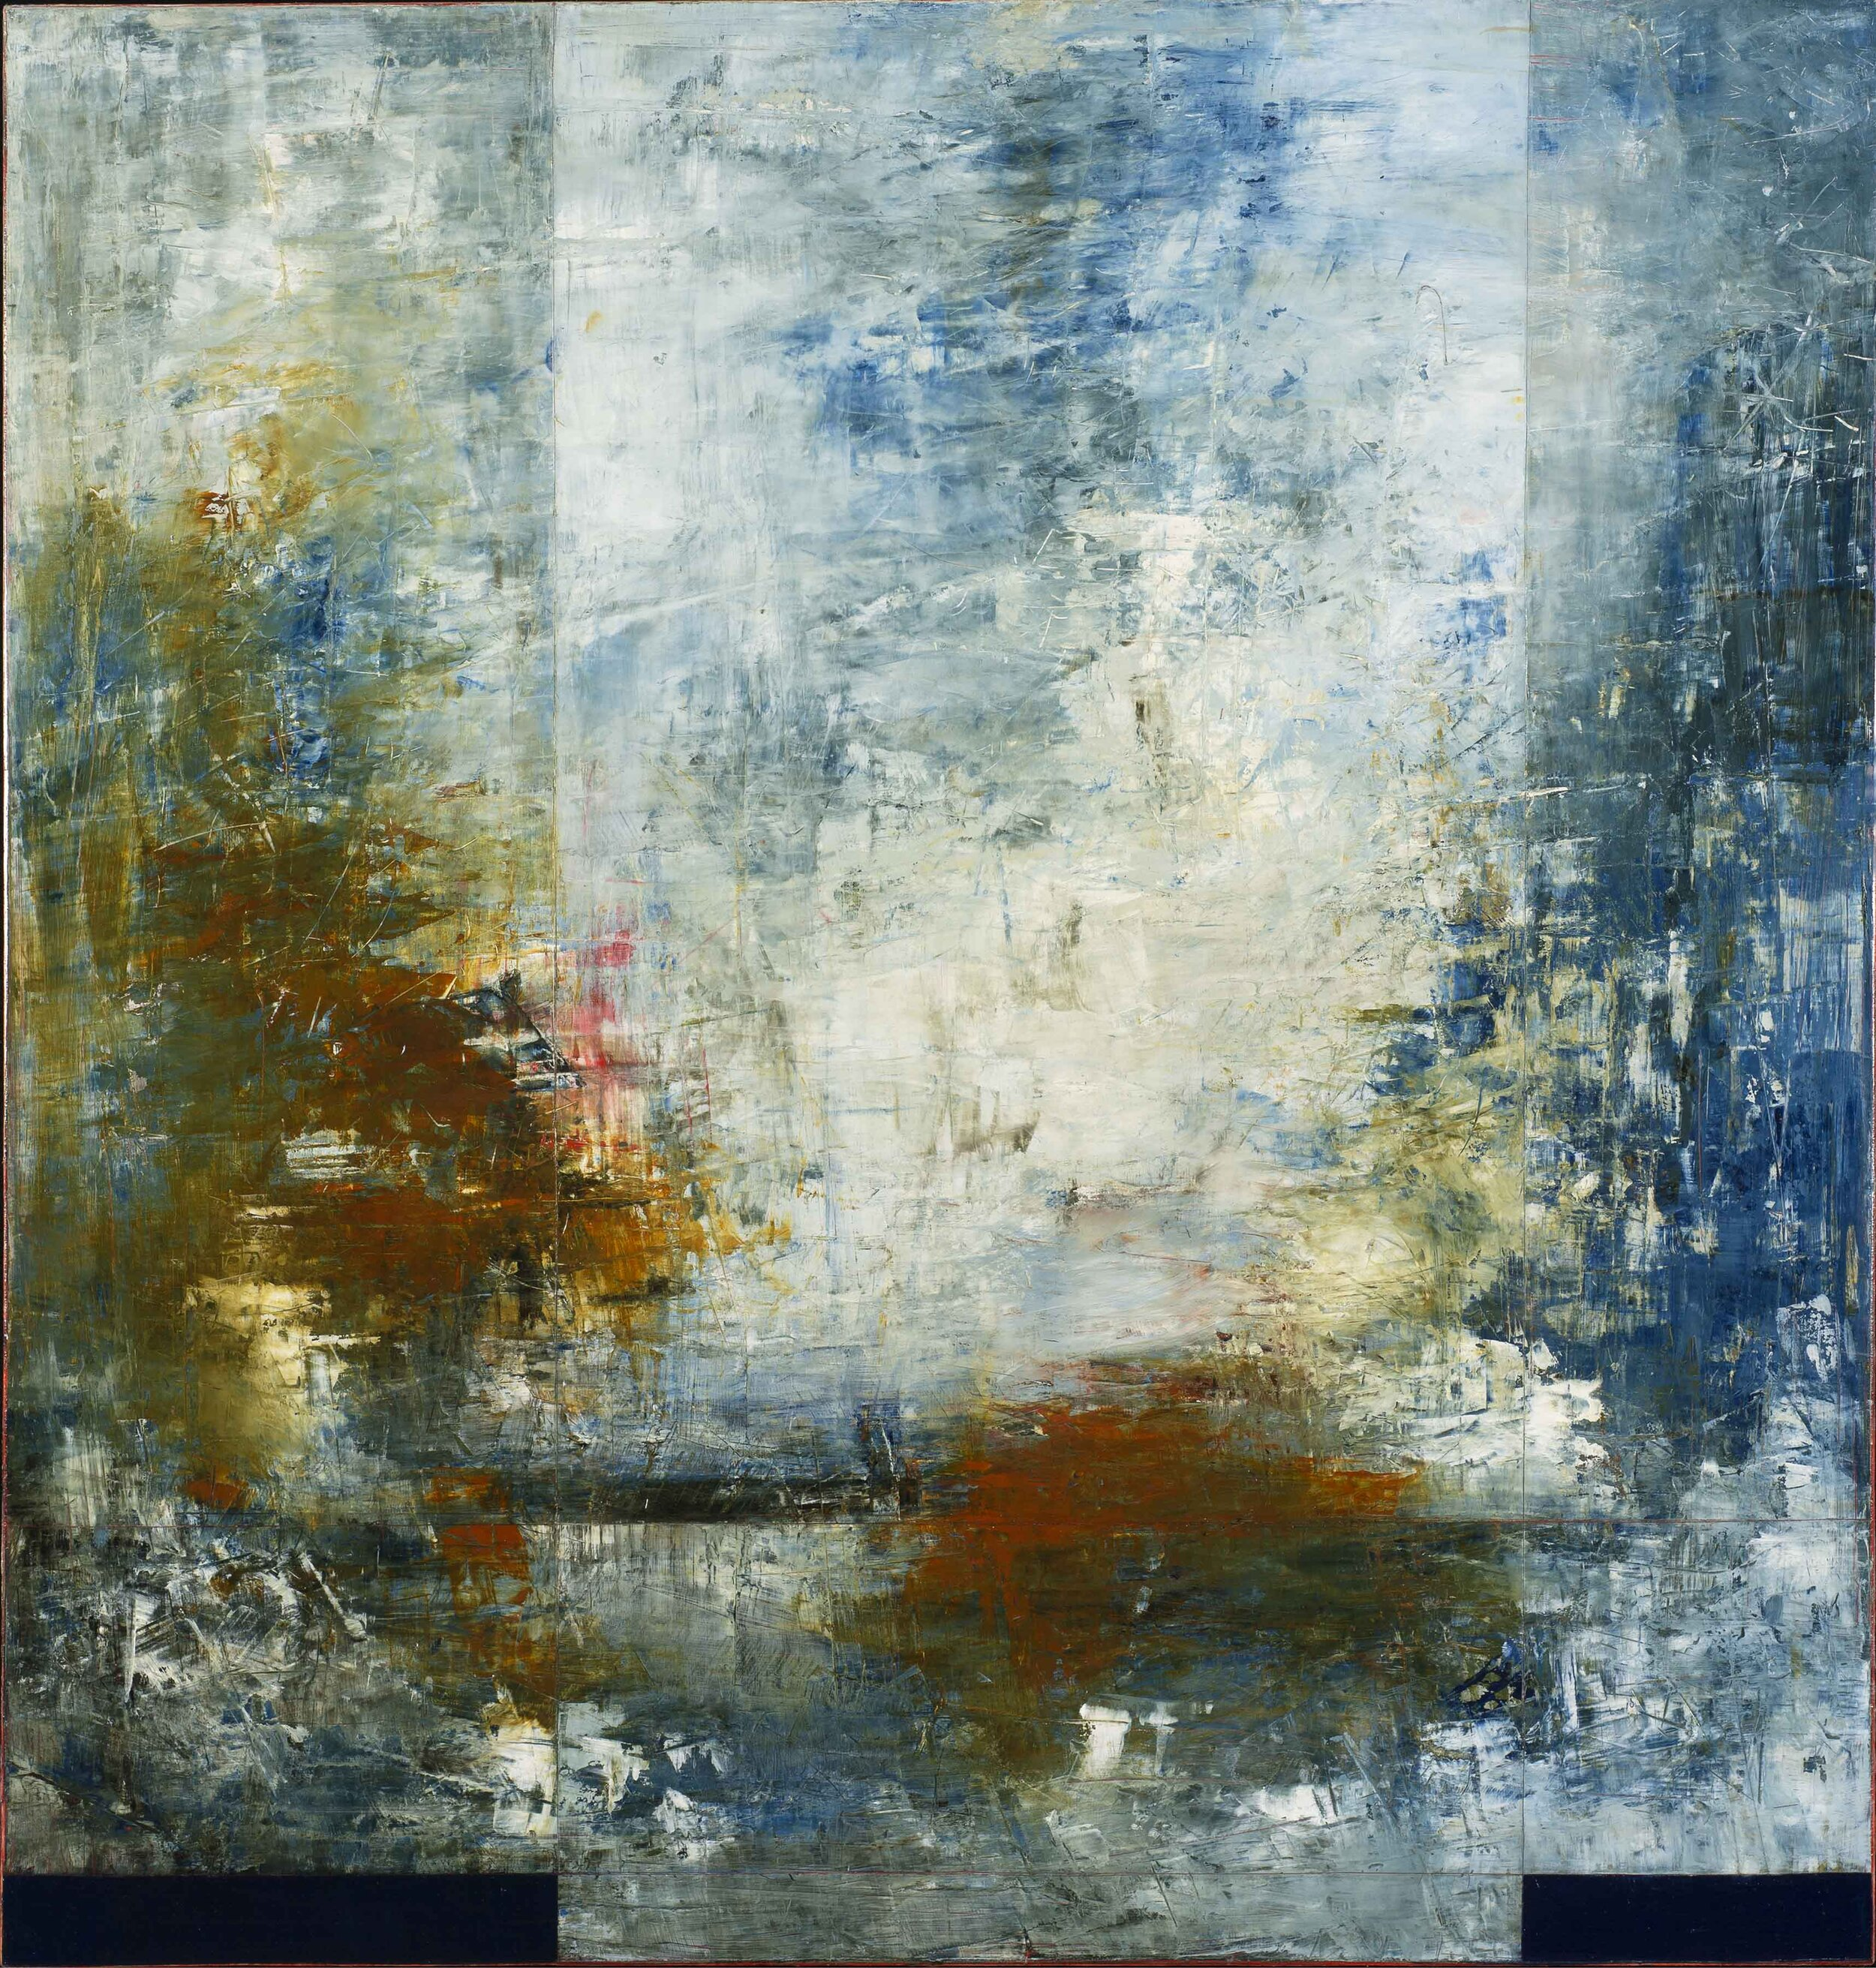 Los Arcos, No. 3, oil on panel, 42x40.jpg